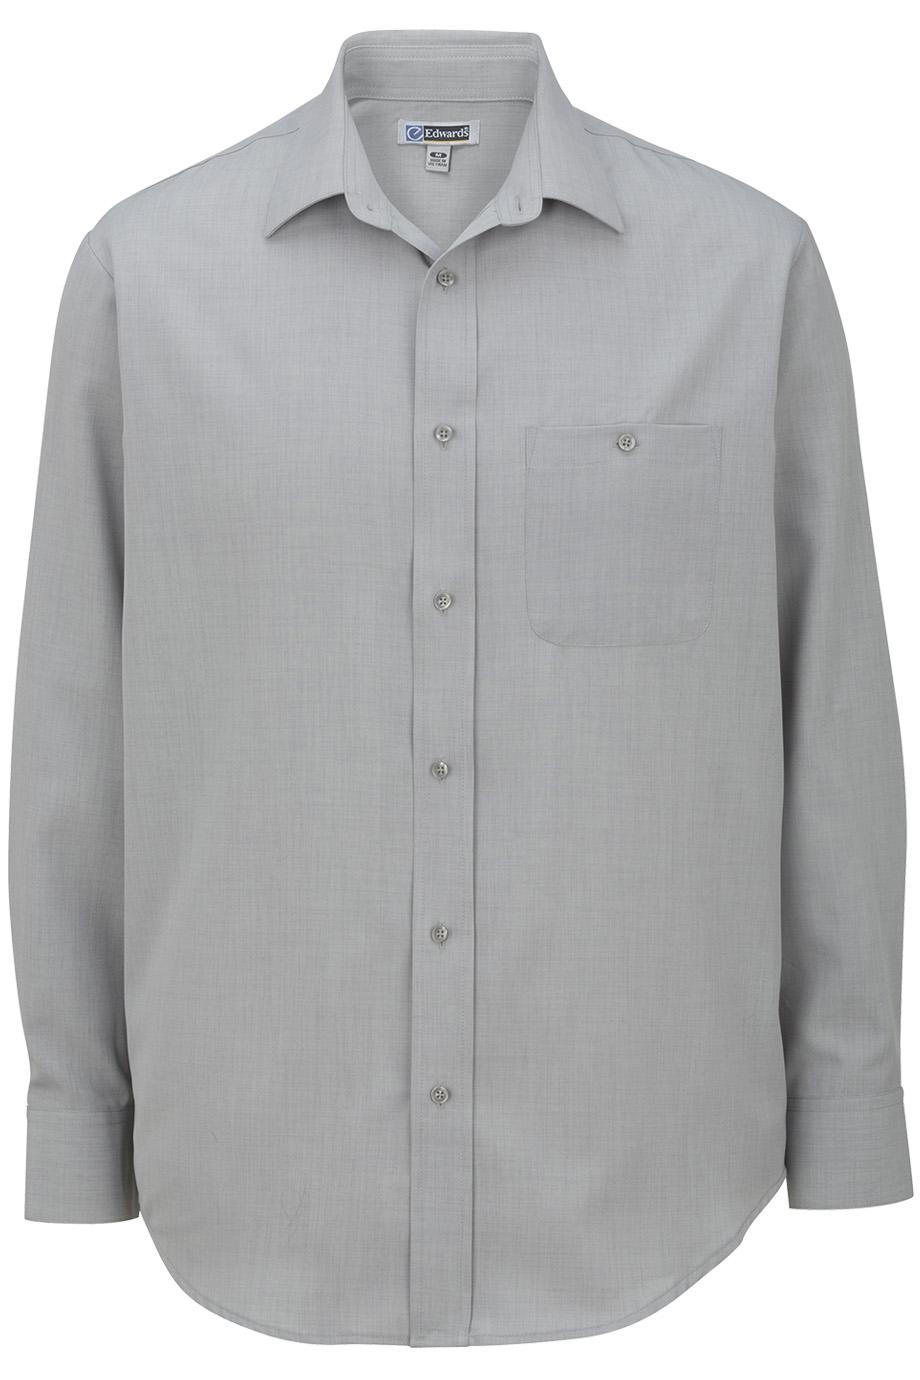 Men's Batiste Dress Shirt 1292